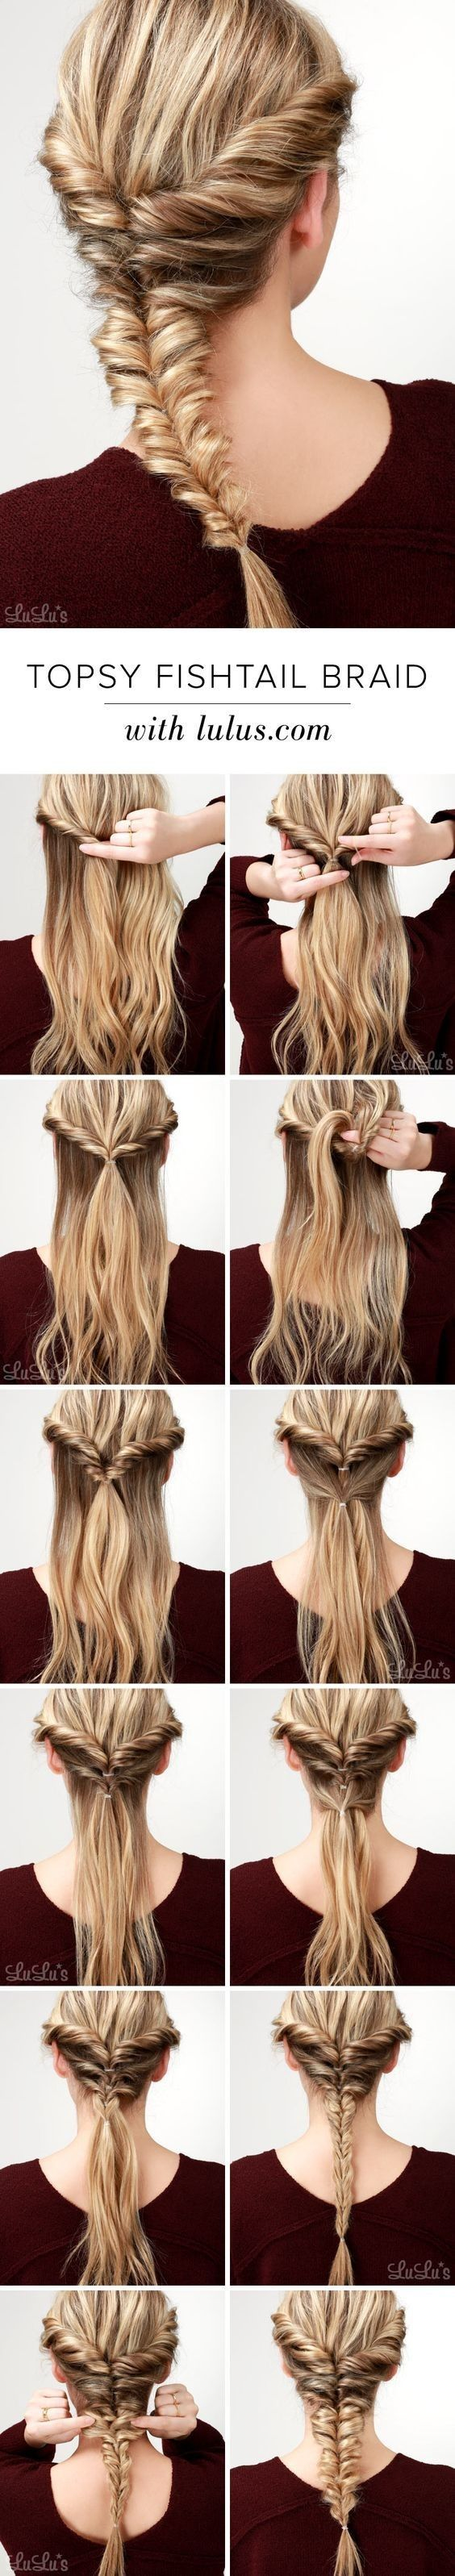 10 süße geflochtene Frisur Ideen – Beste Frisuren